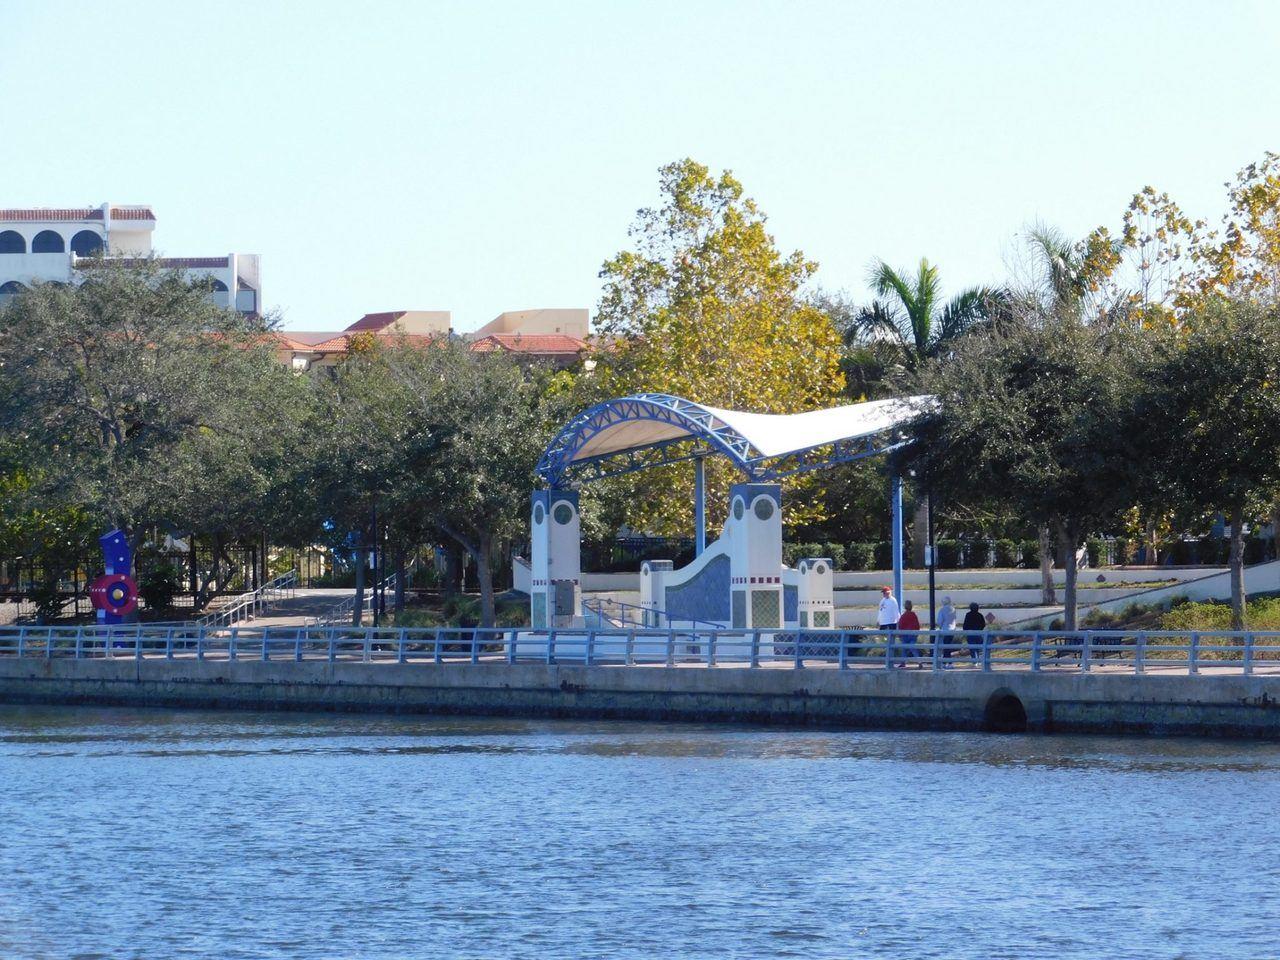 Riverwalk de Bradenton en Floride.